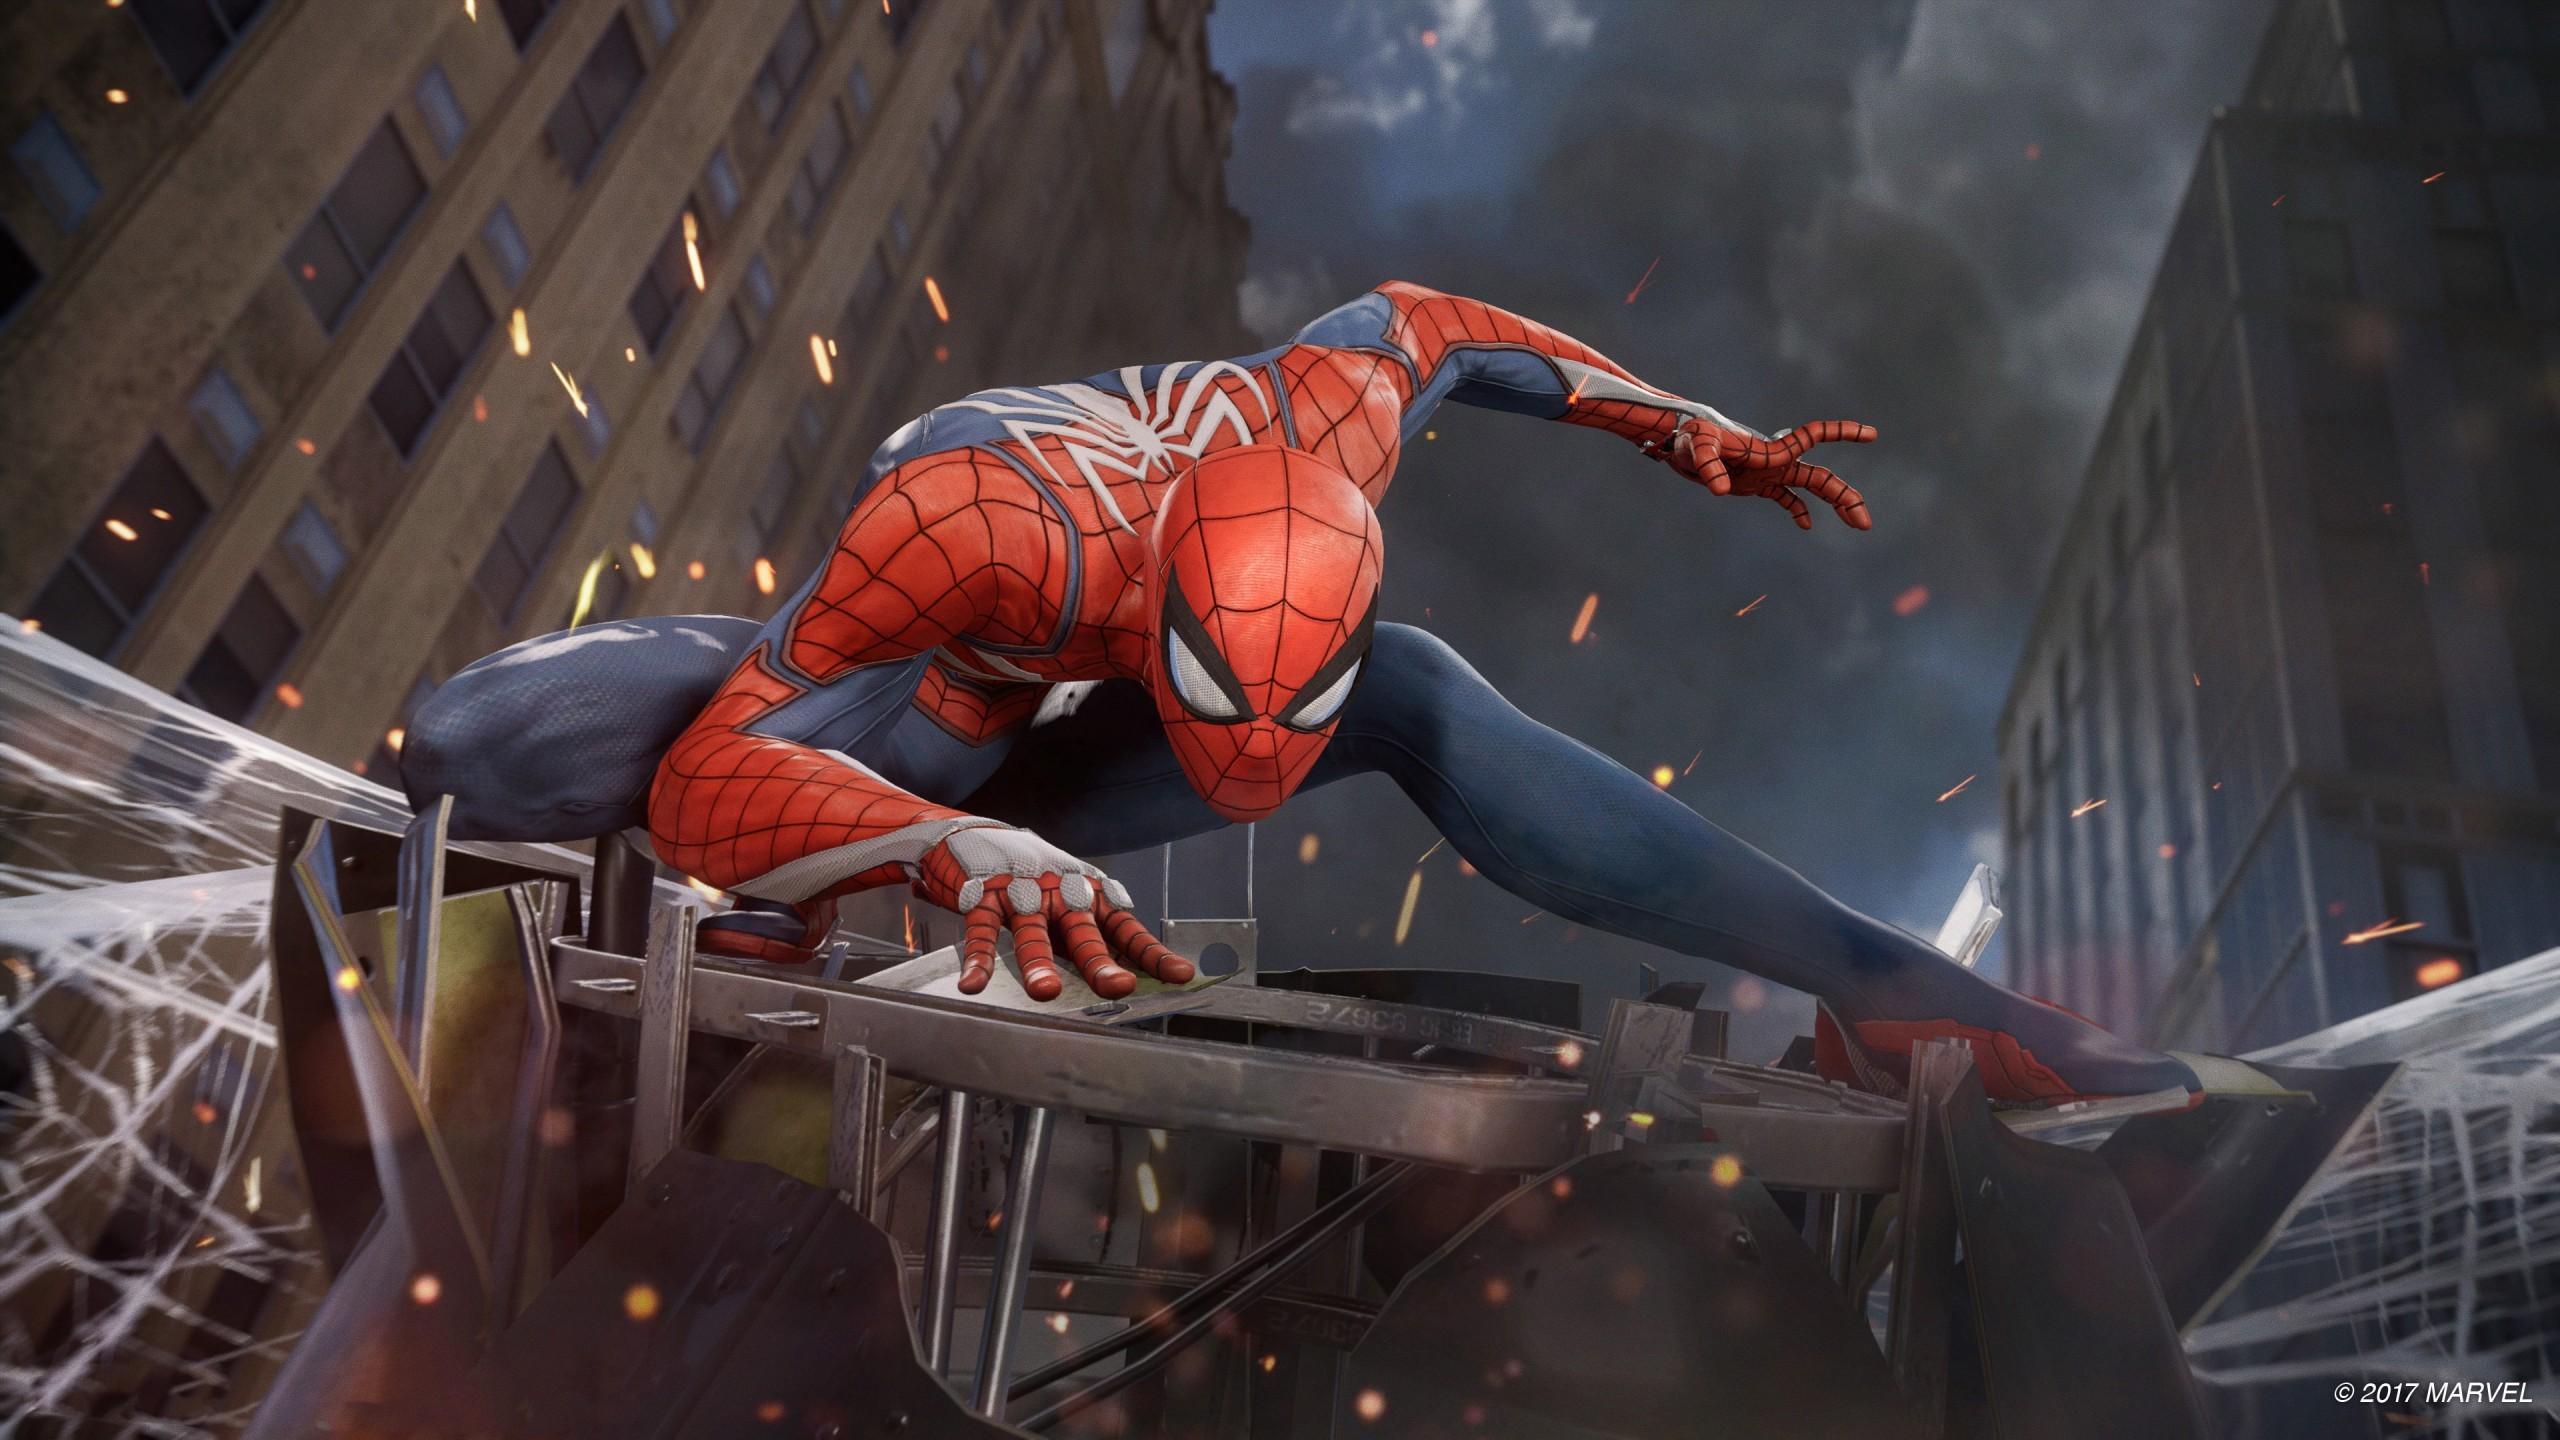 4k spiderman wallpaper 55